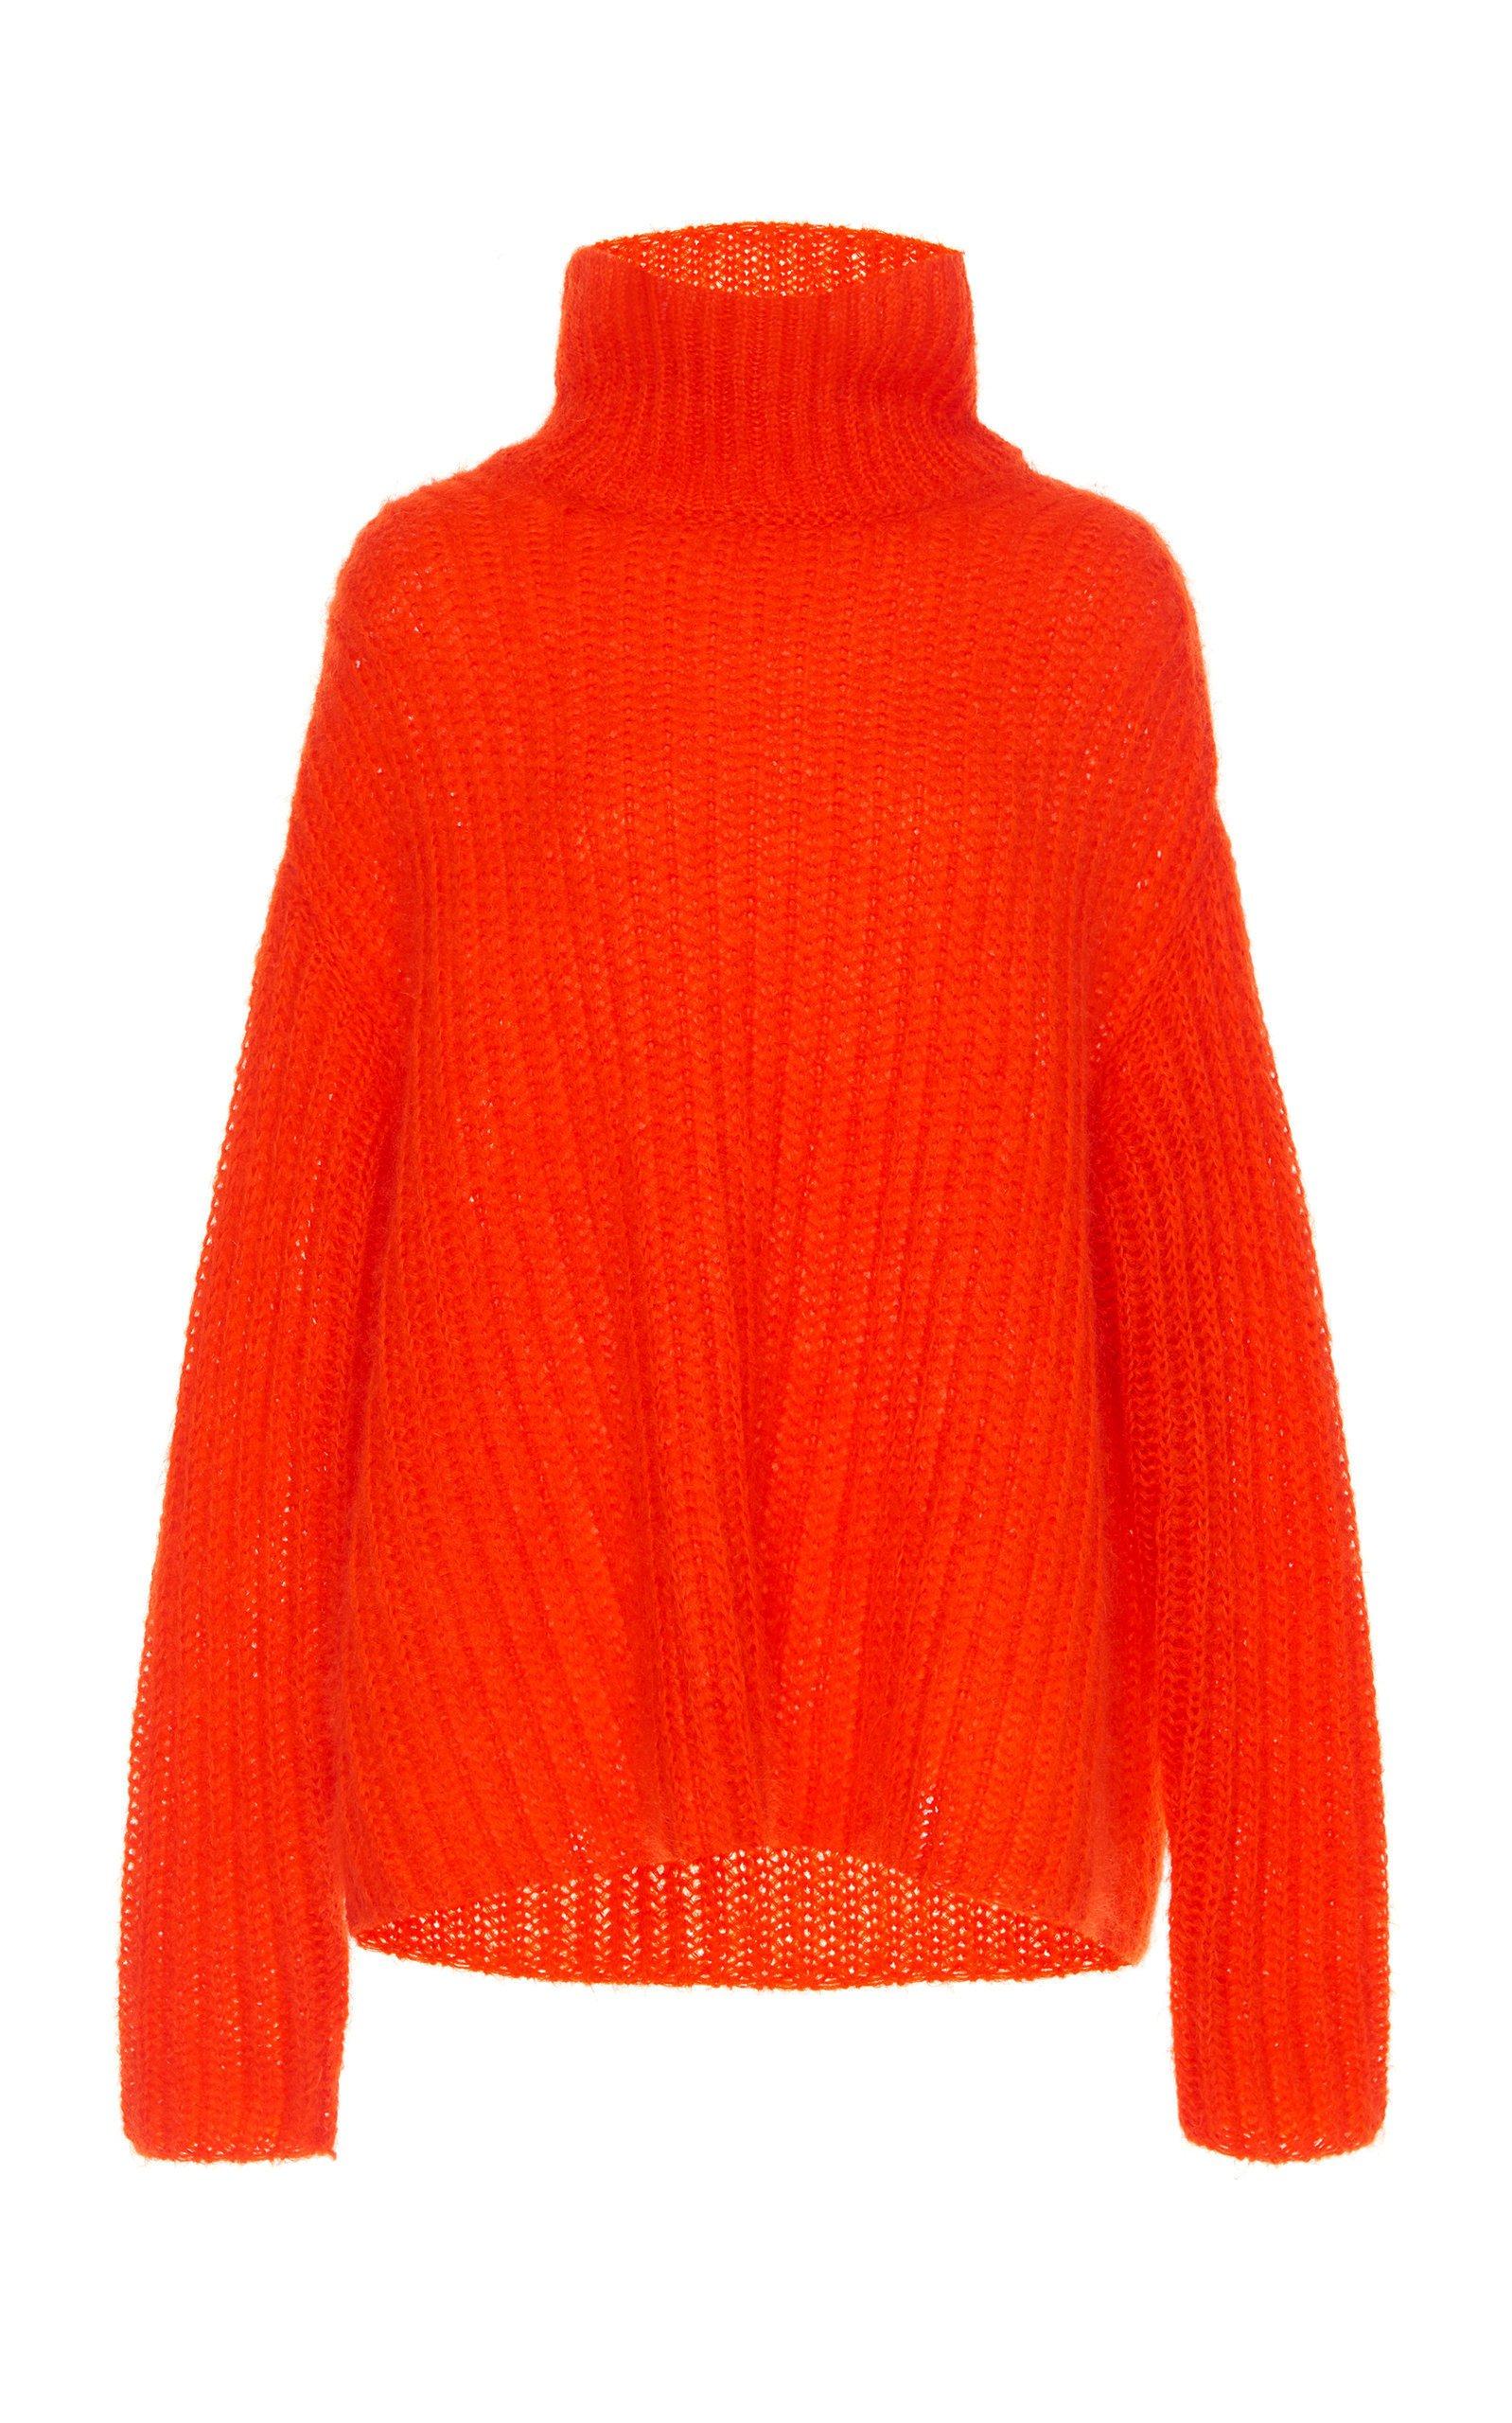 Marni Mohair-Blend Turtleneck Sweater